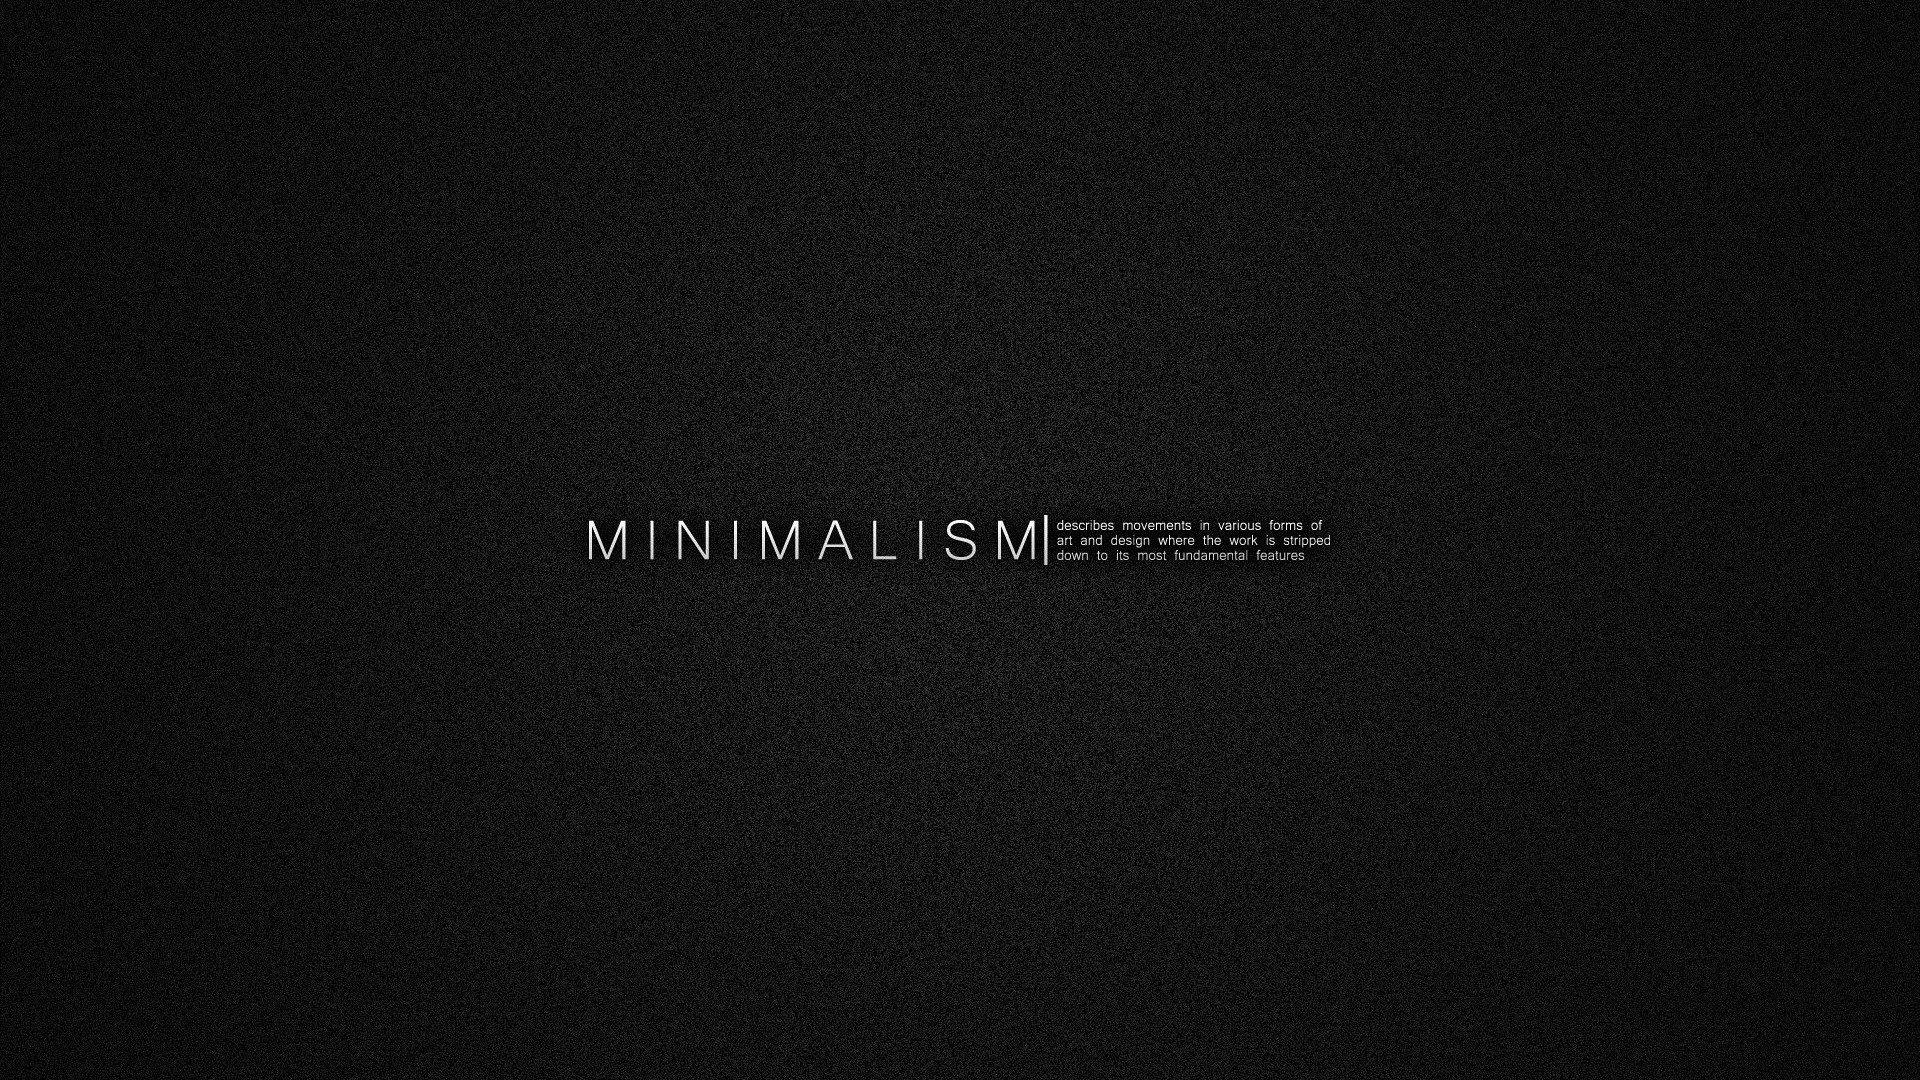 1080p minimalist wallpaper wallpapersafari for Define minimalist design